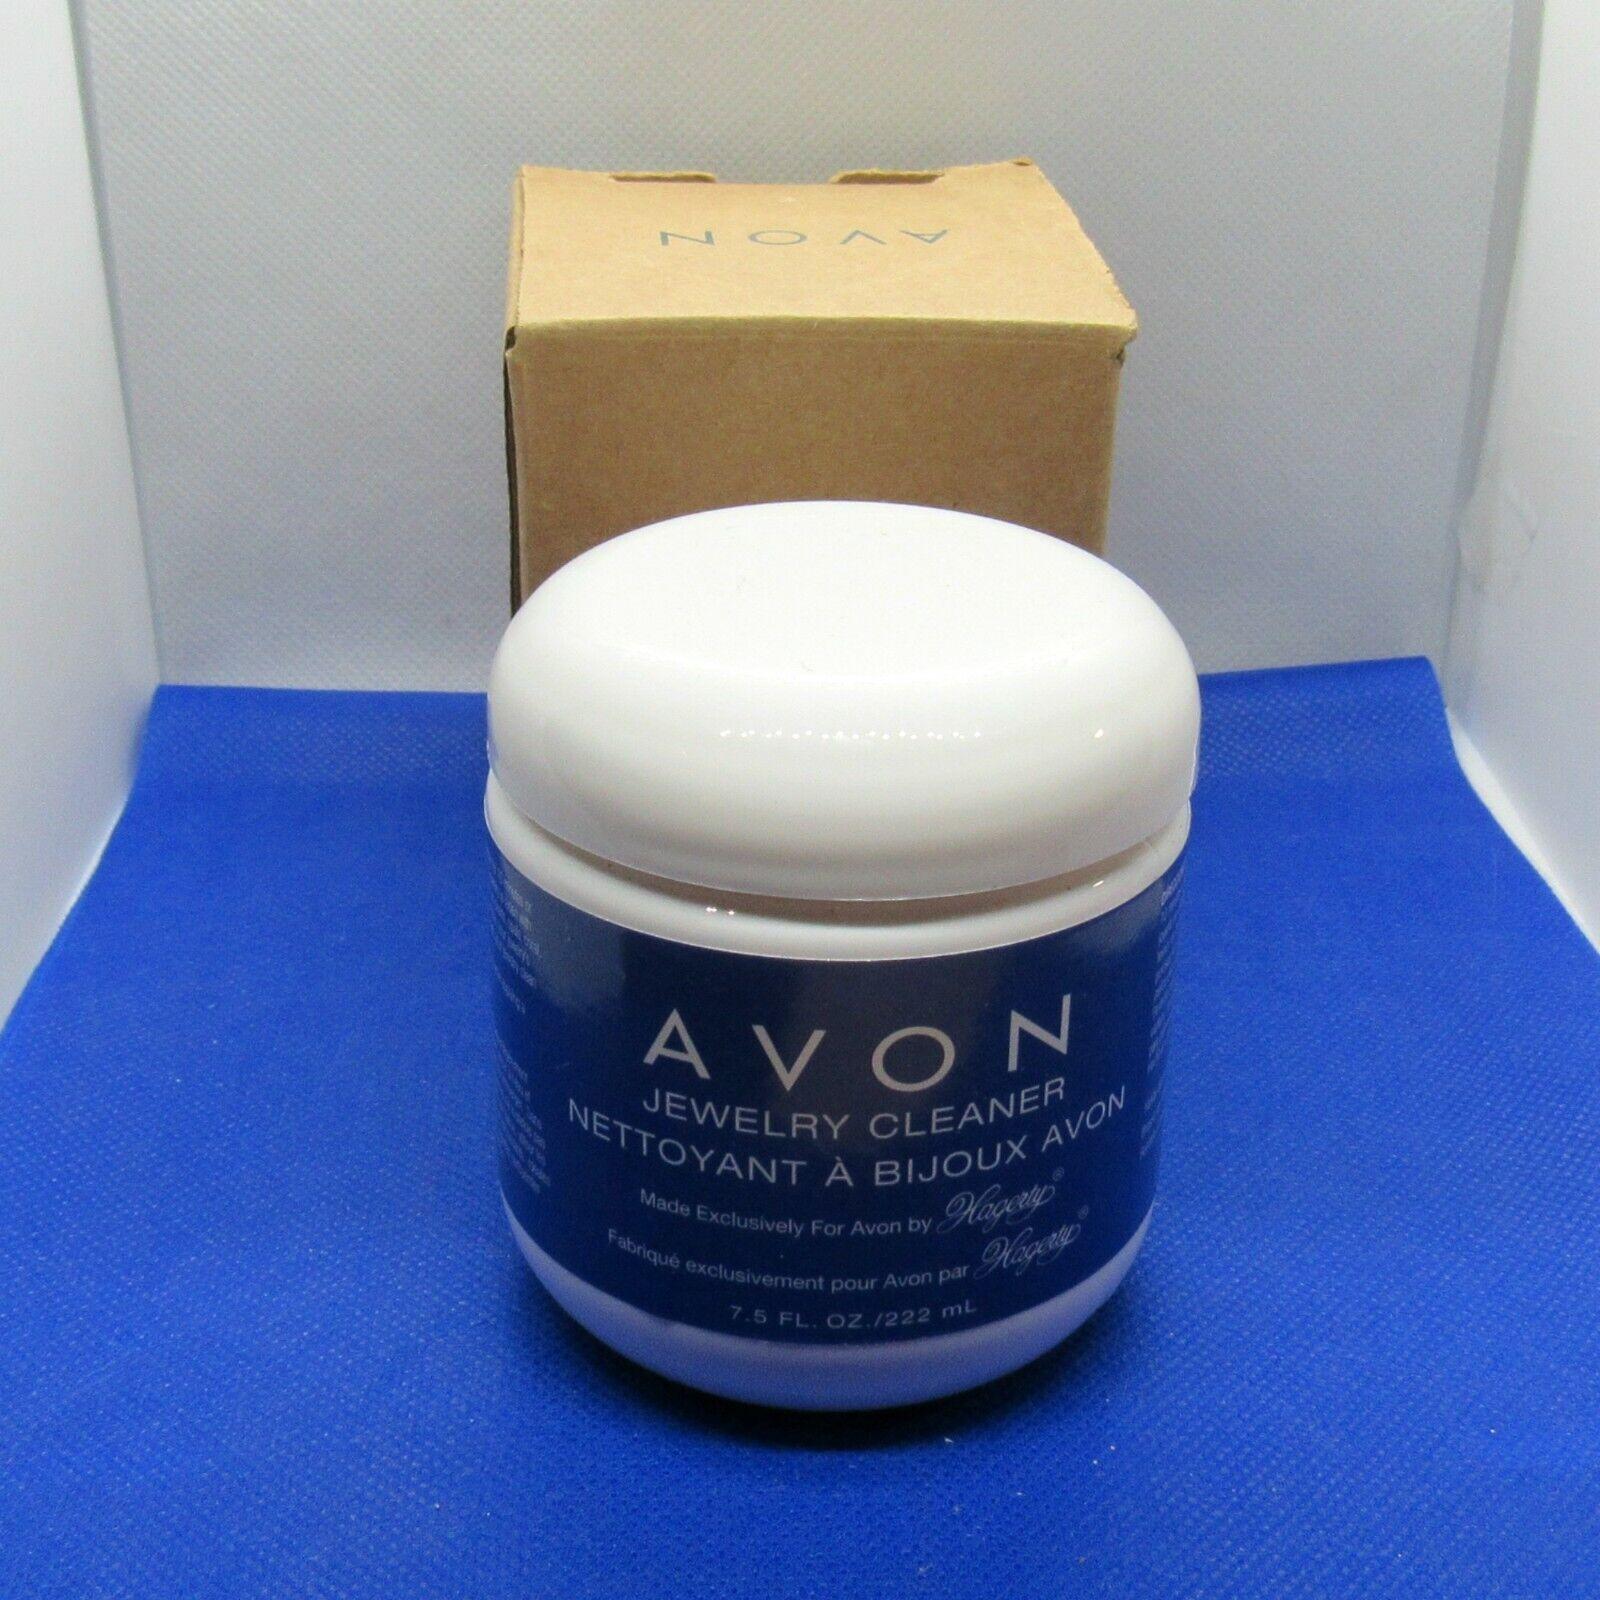 2004 Avon Jewelry Cleaner 7.5 oz